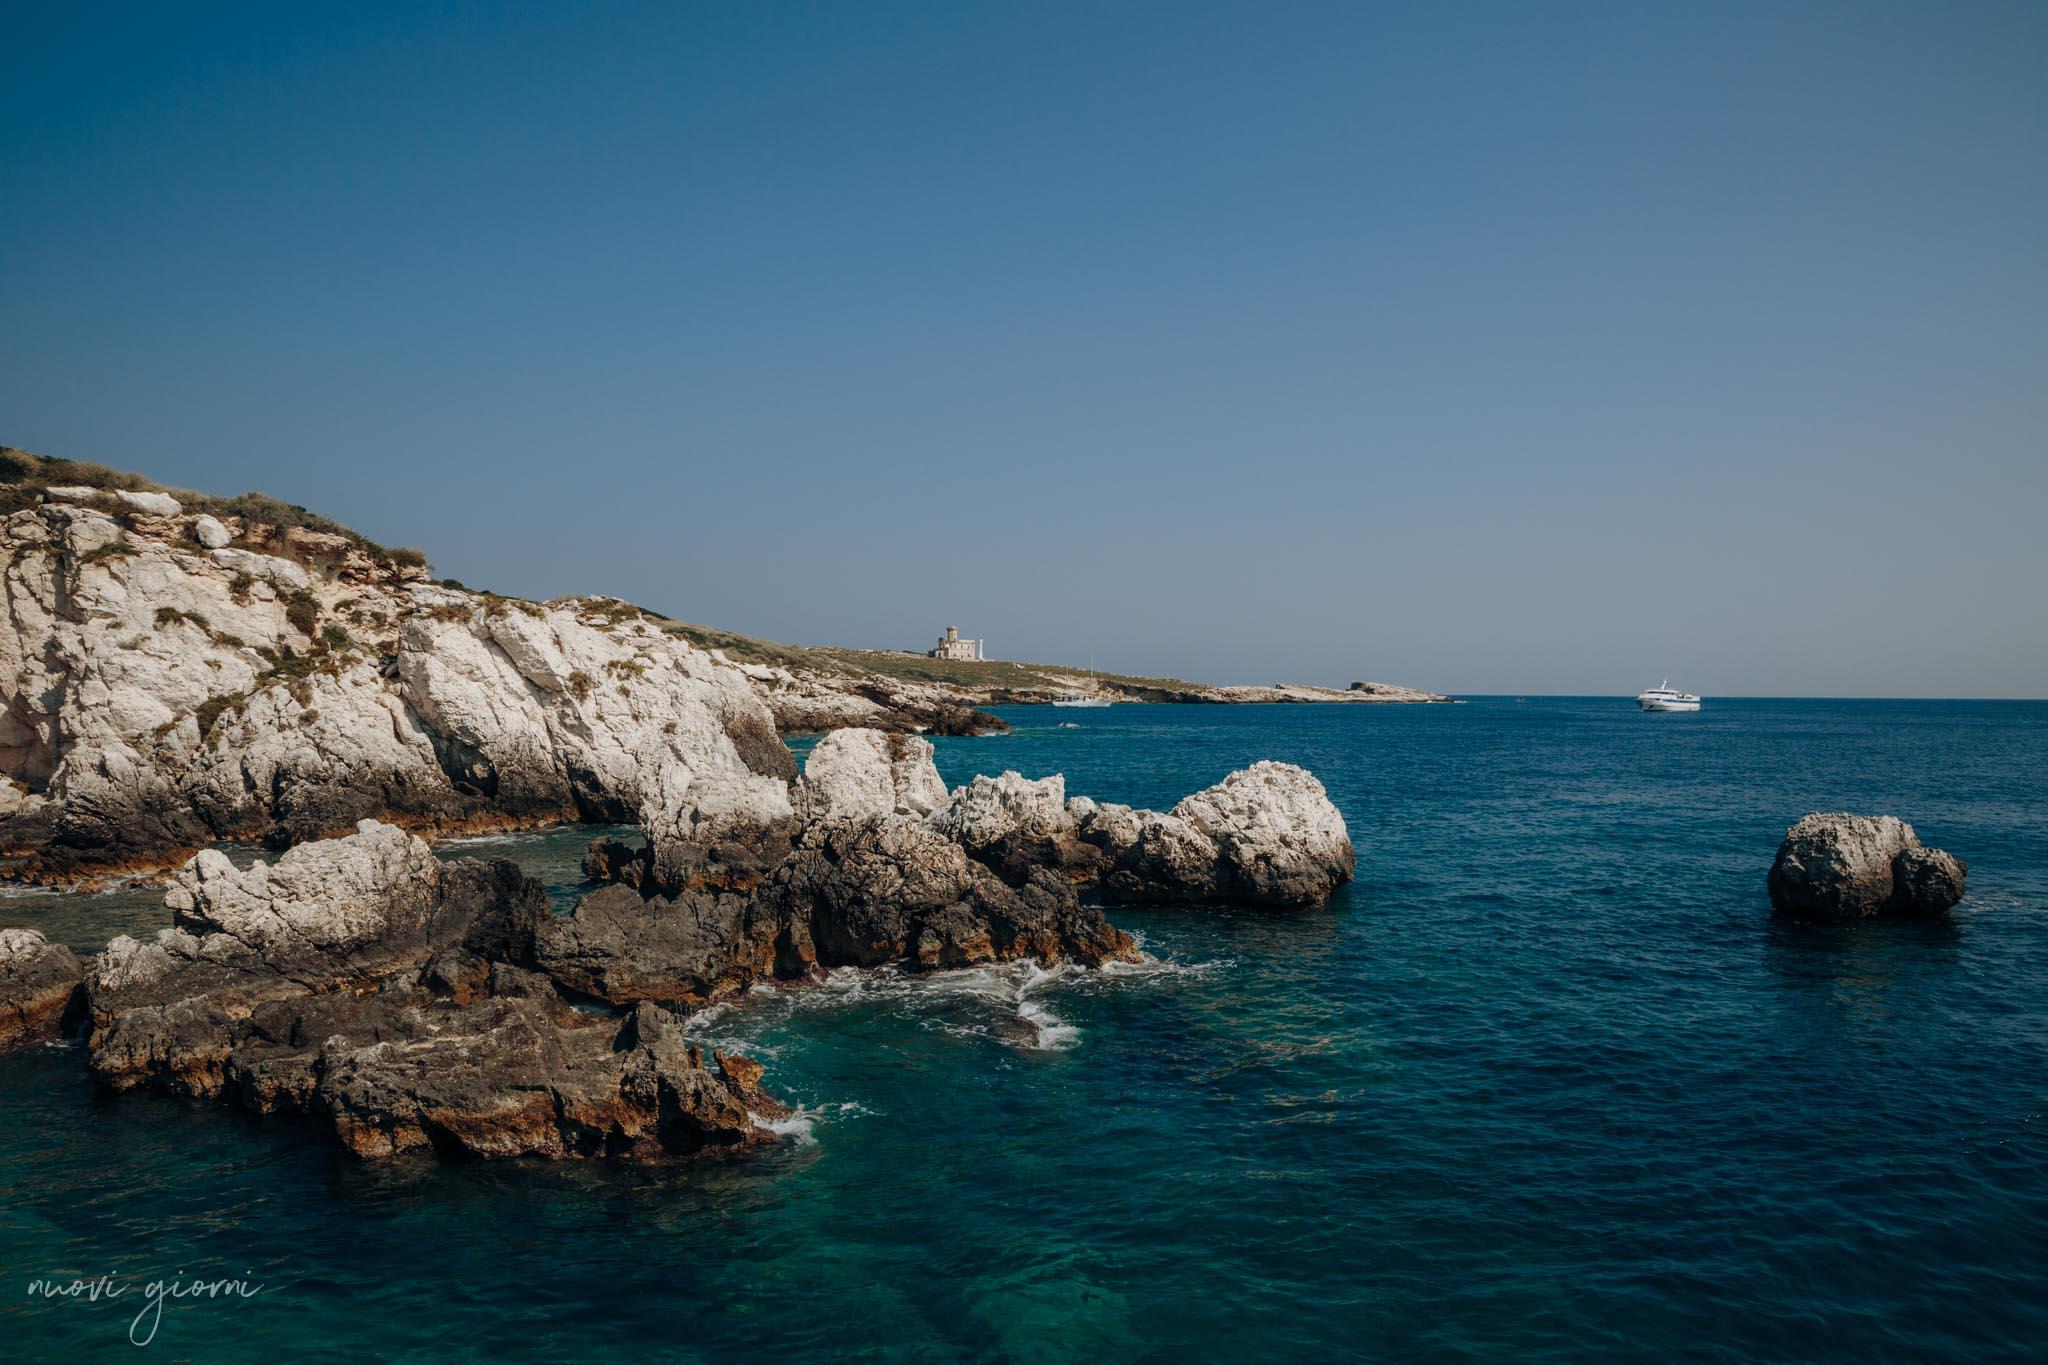 Isole Tremiti Nuovi Giorni Blog 9194